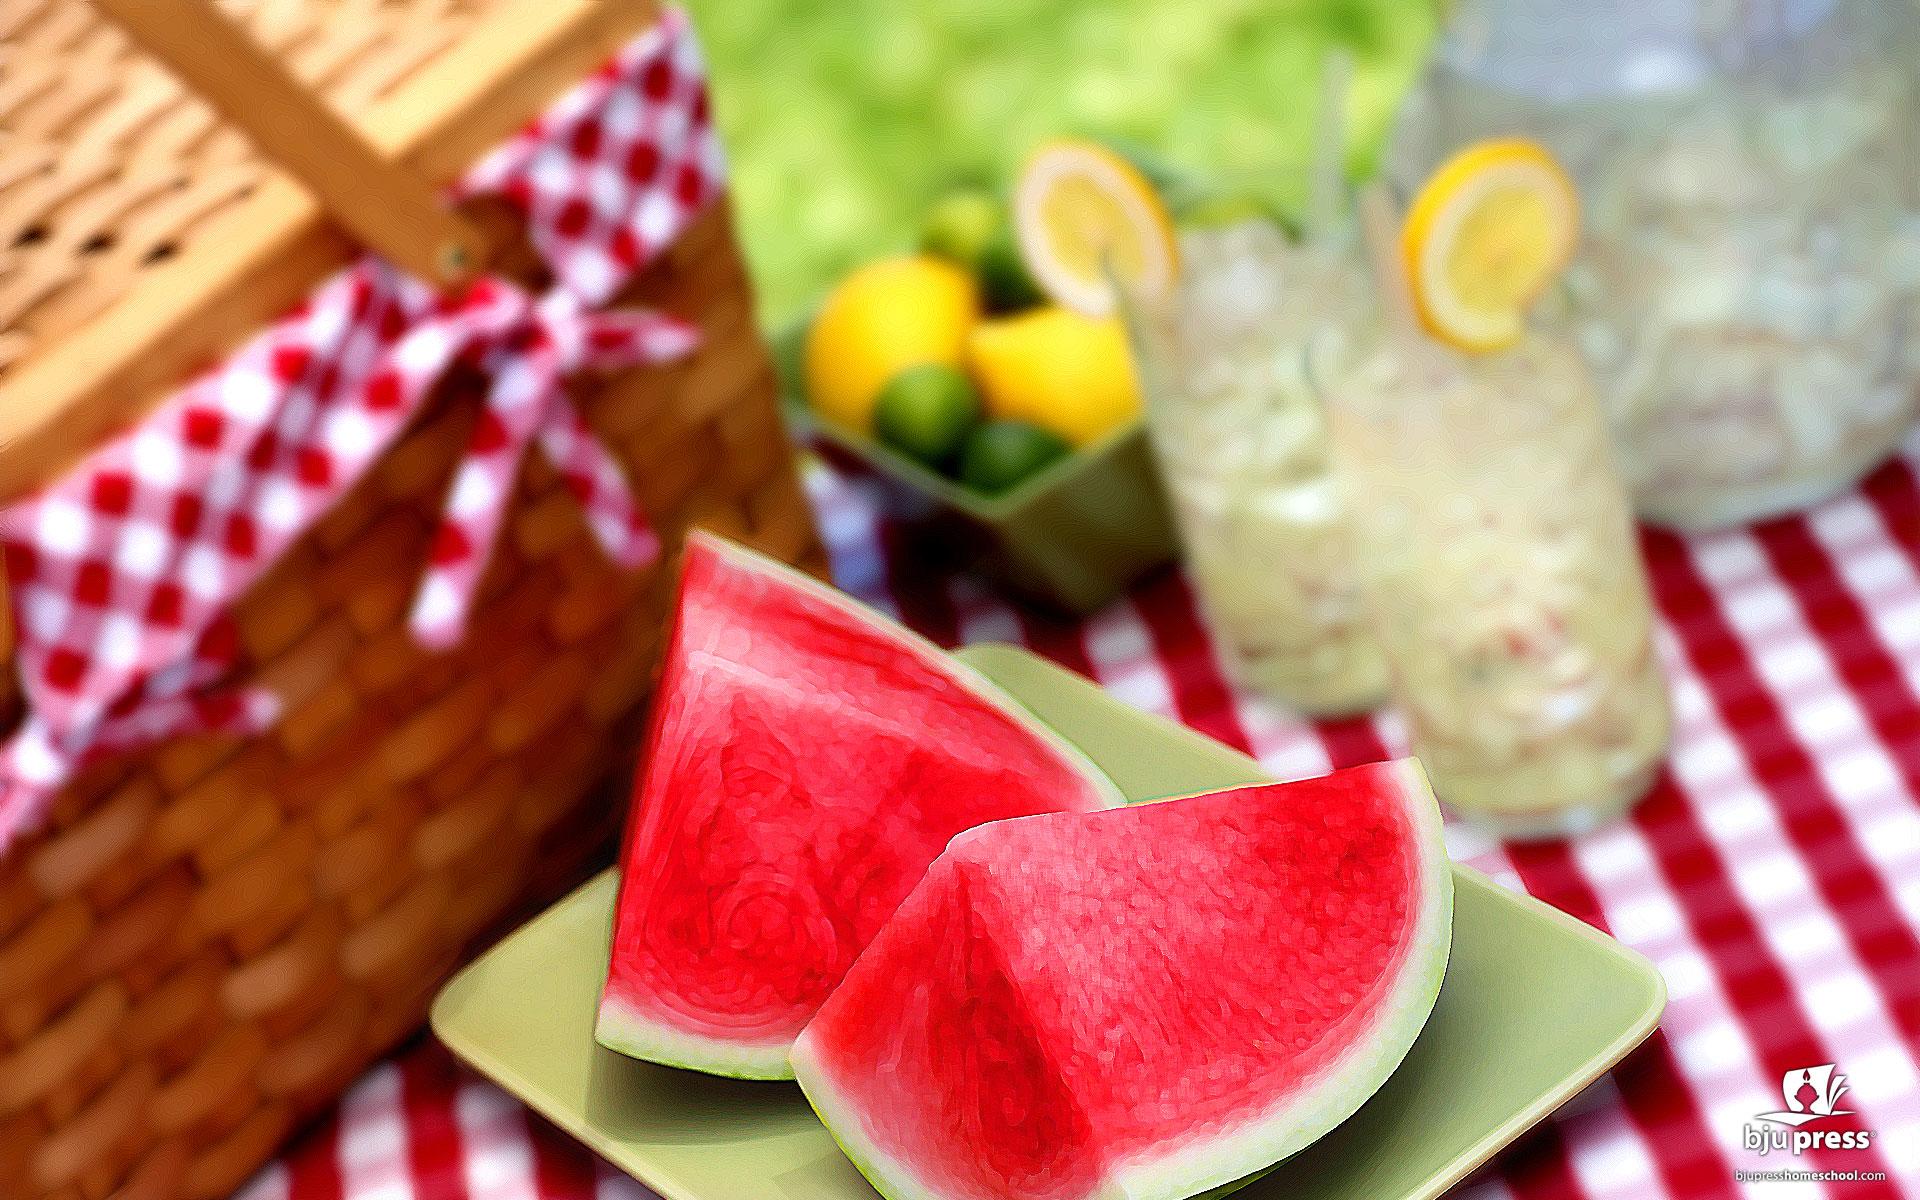 church picnic background - photo #35